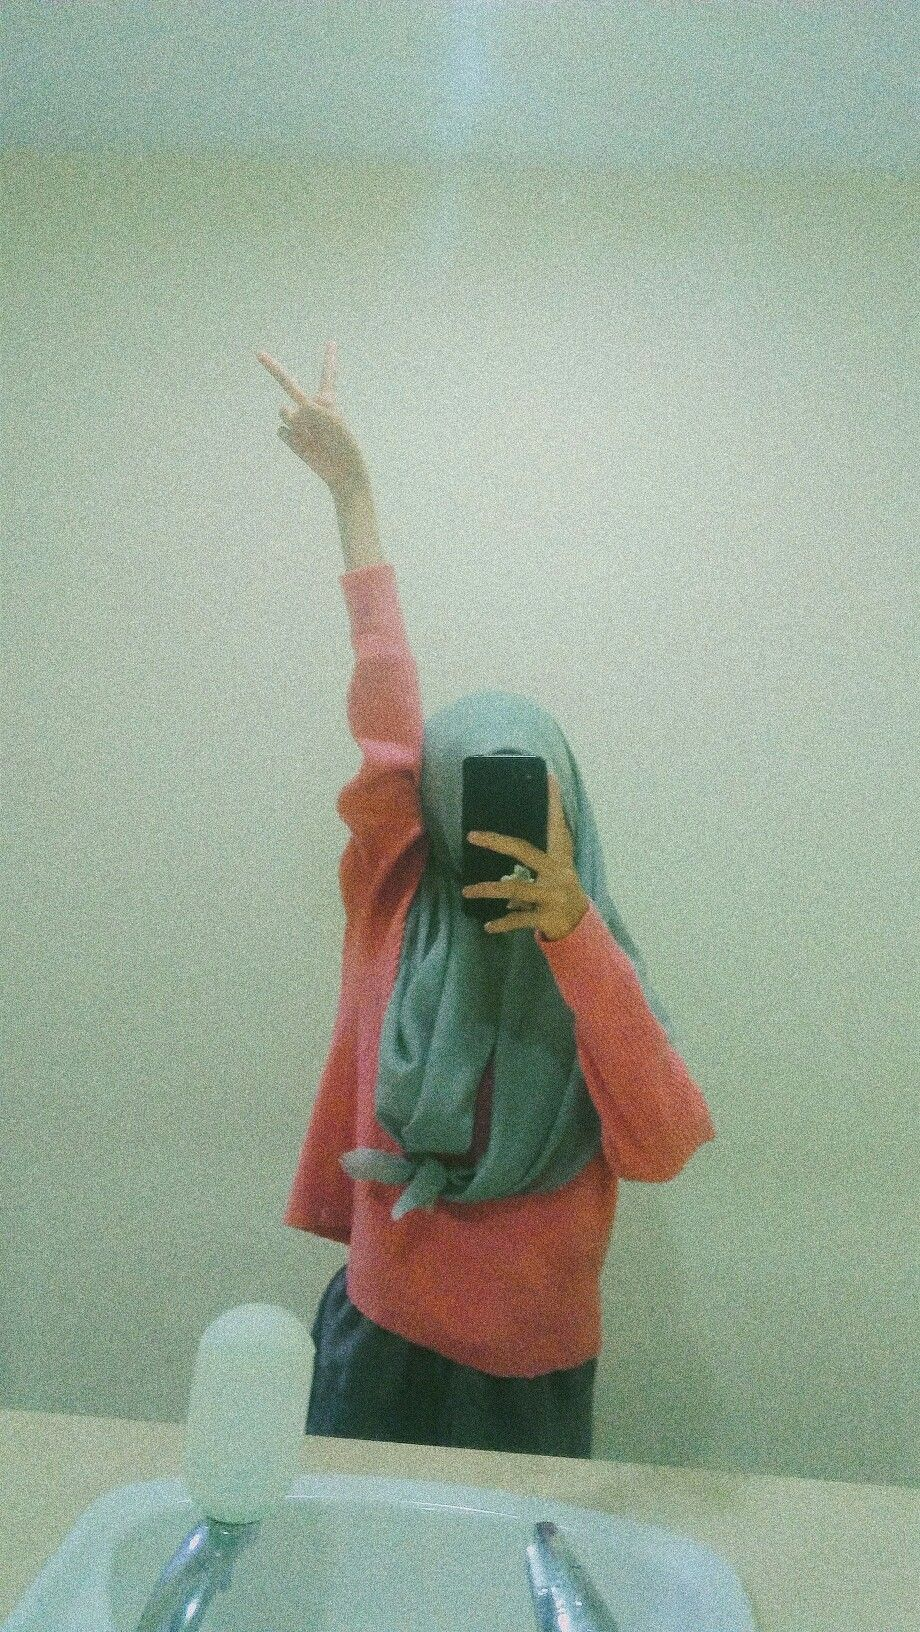 mirrorselfie aesthetic girl tumblr   Gaya remaja, Fotografi ...